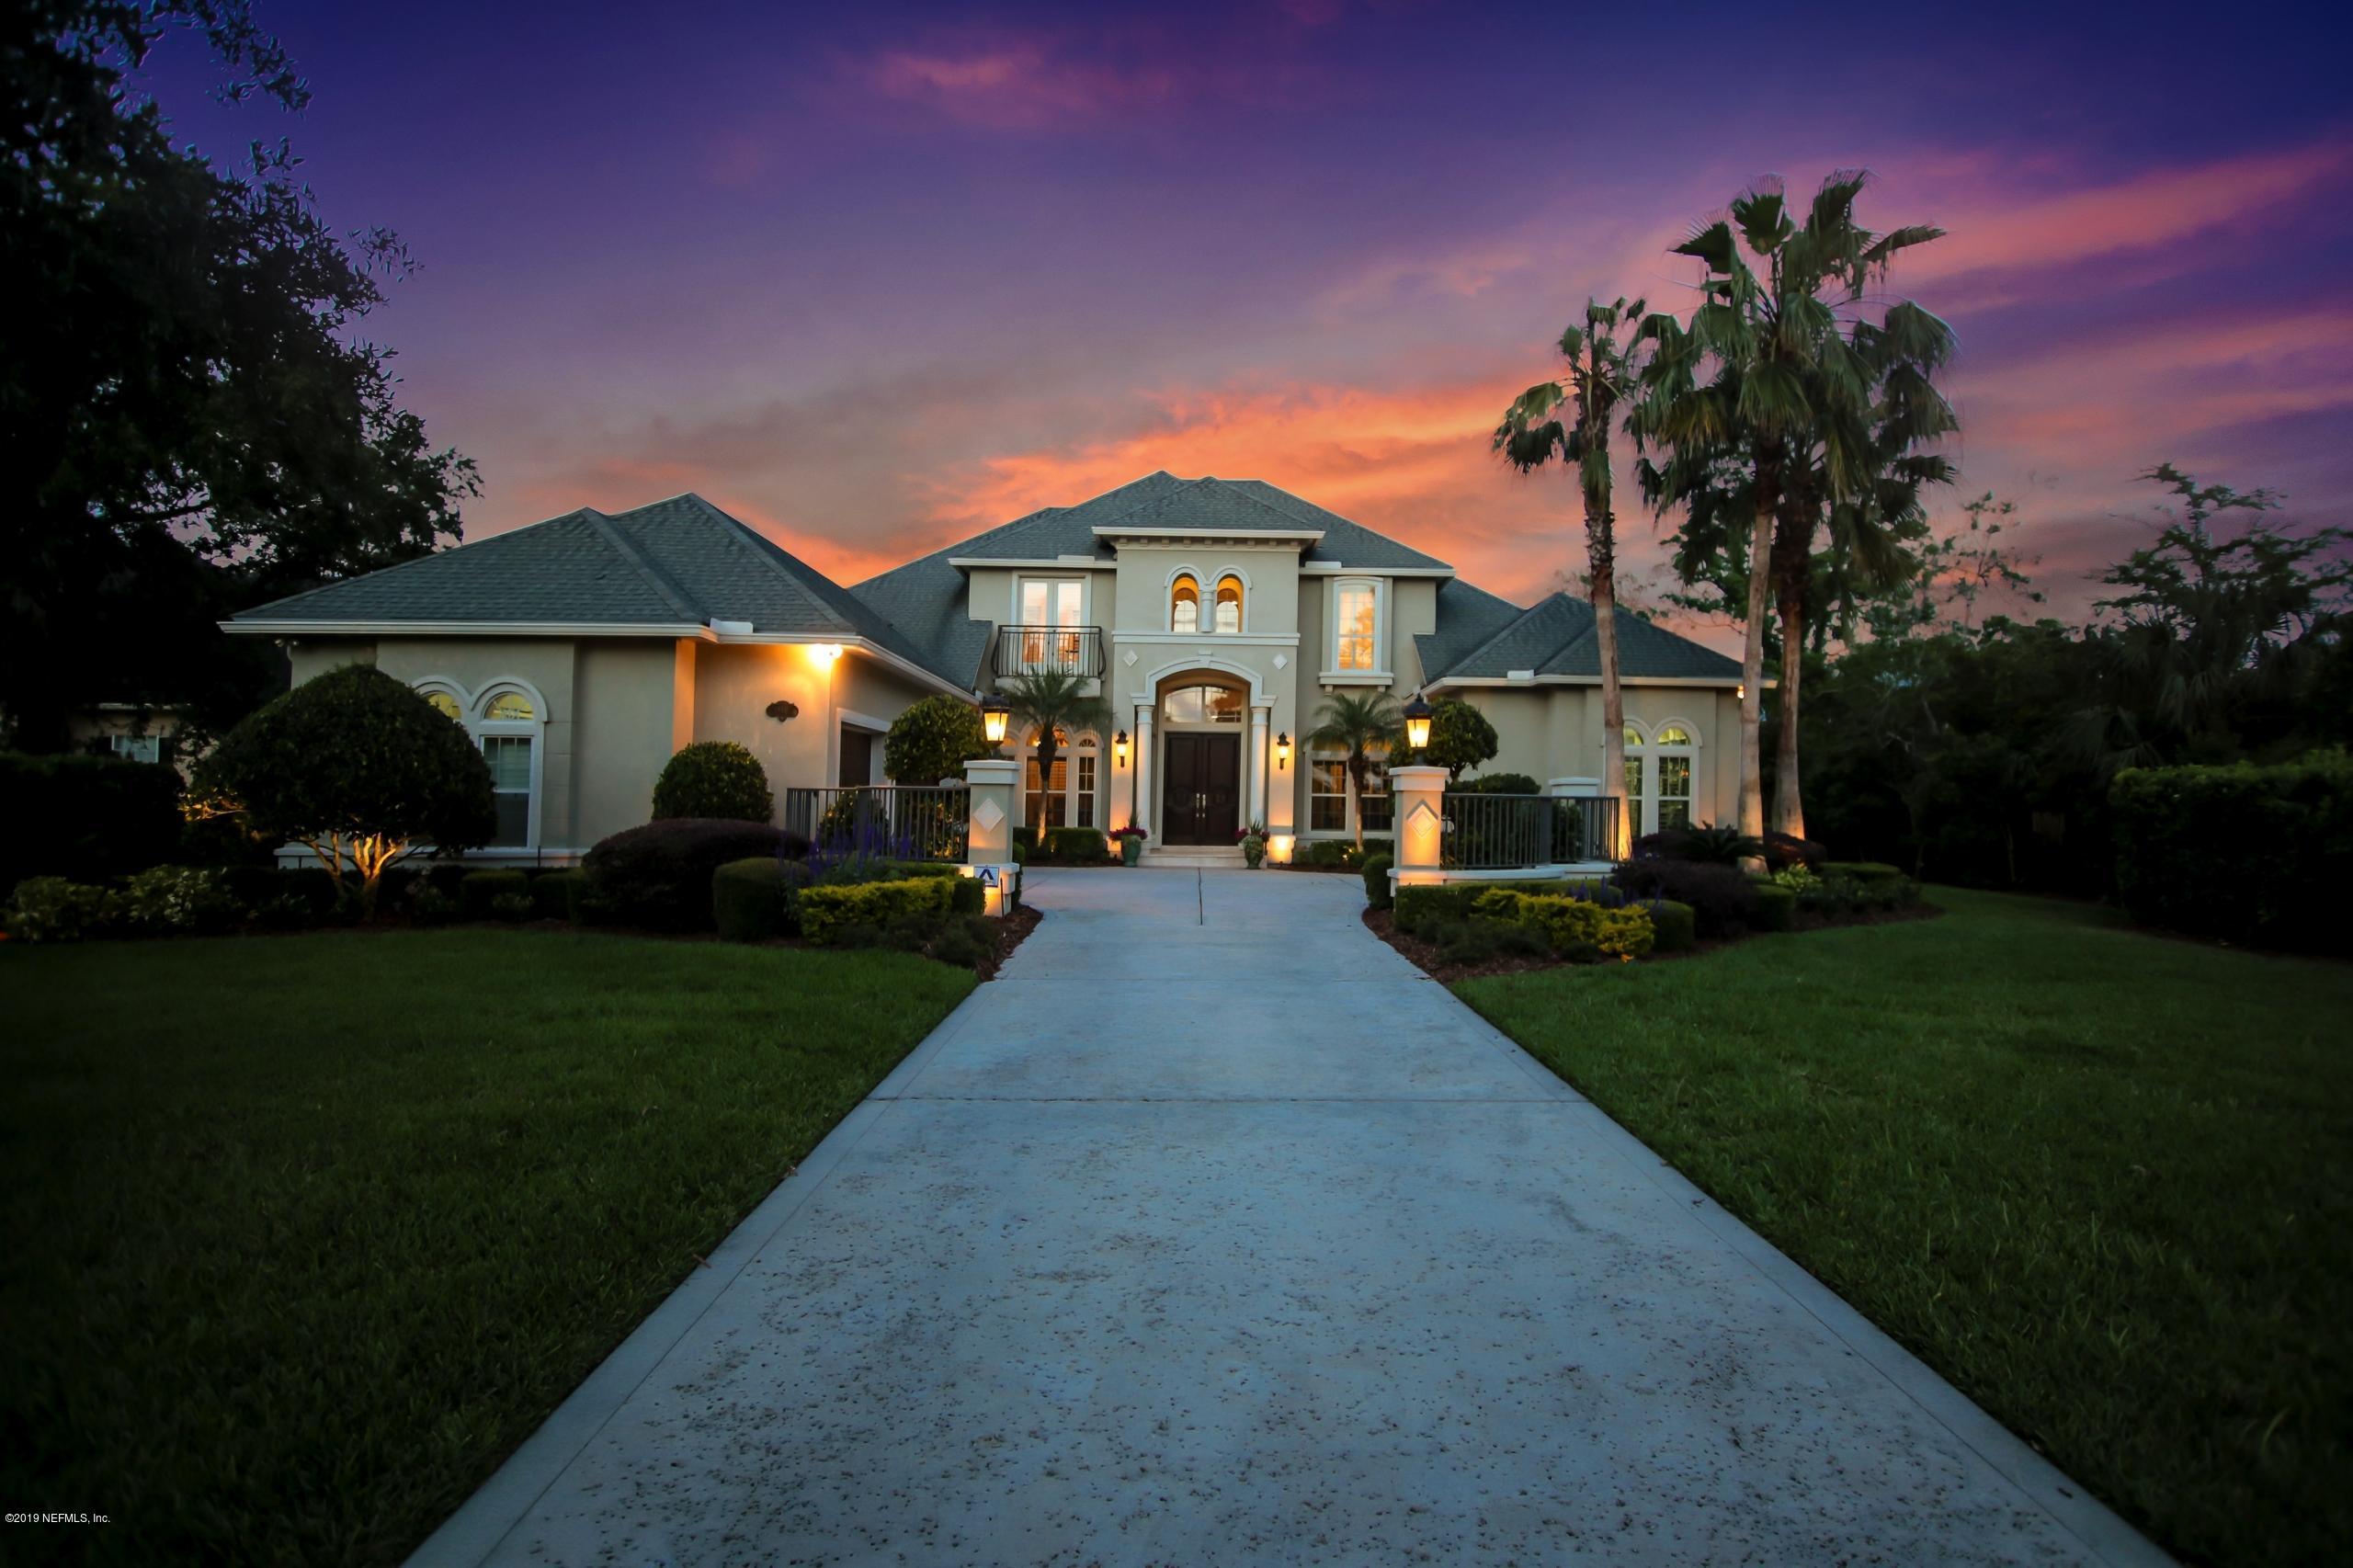 4451 ROYAL TERN, JACKSONVILLE BEACH, FLORIDA 32250, 5 Bedrooms Bedrooms, ,5 BathroomsBathrooms,Residential - single family,For sale,ROYAL TERN,994677